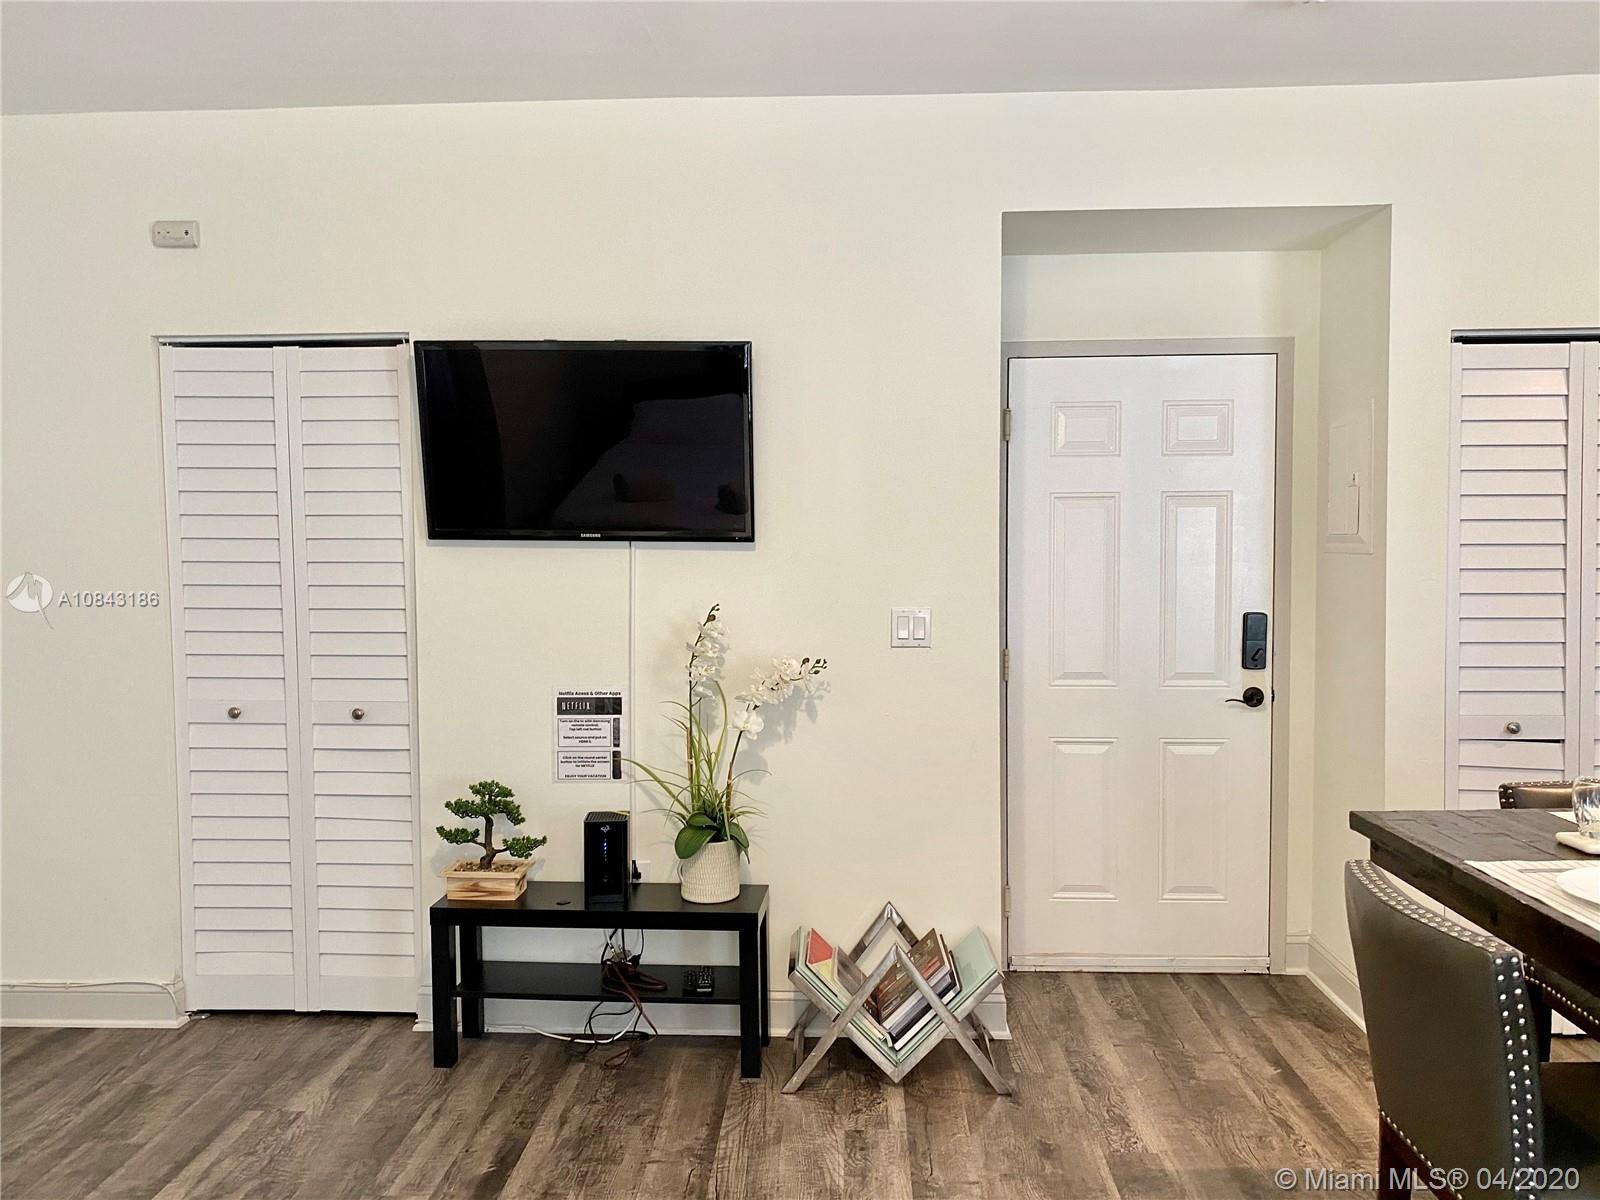 1358 Pennsylvania Av # 305, Miami Beach, Florida 33139, 1 Bedroom Bedrooms, ,1 BathroomBathrooms,Residential,For Sale,1358 Pennsylvania Av # 305,A10843186